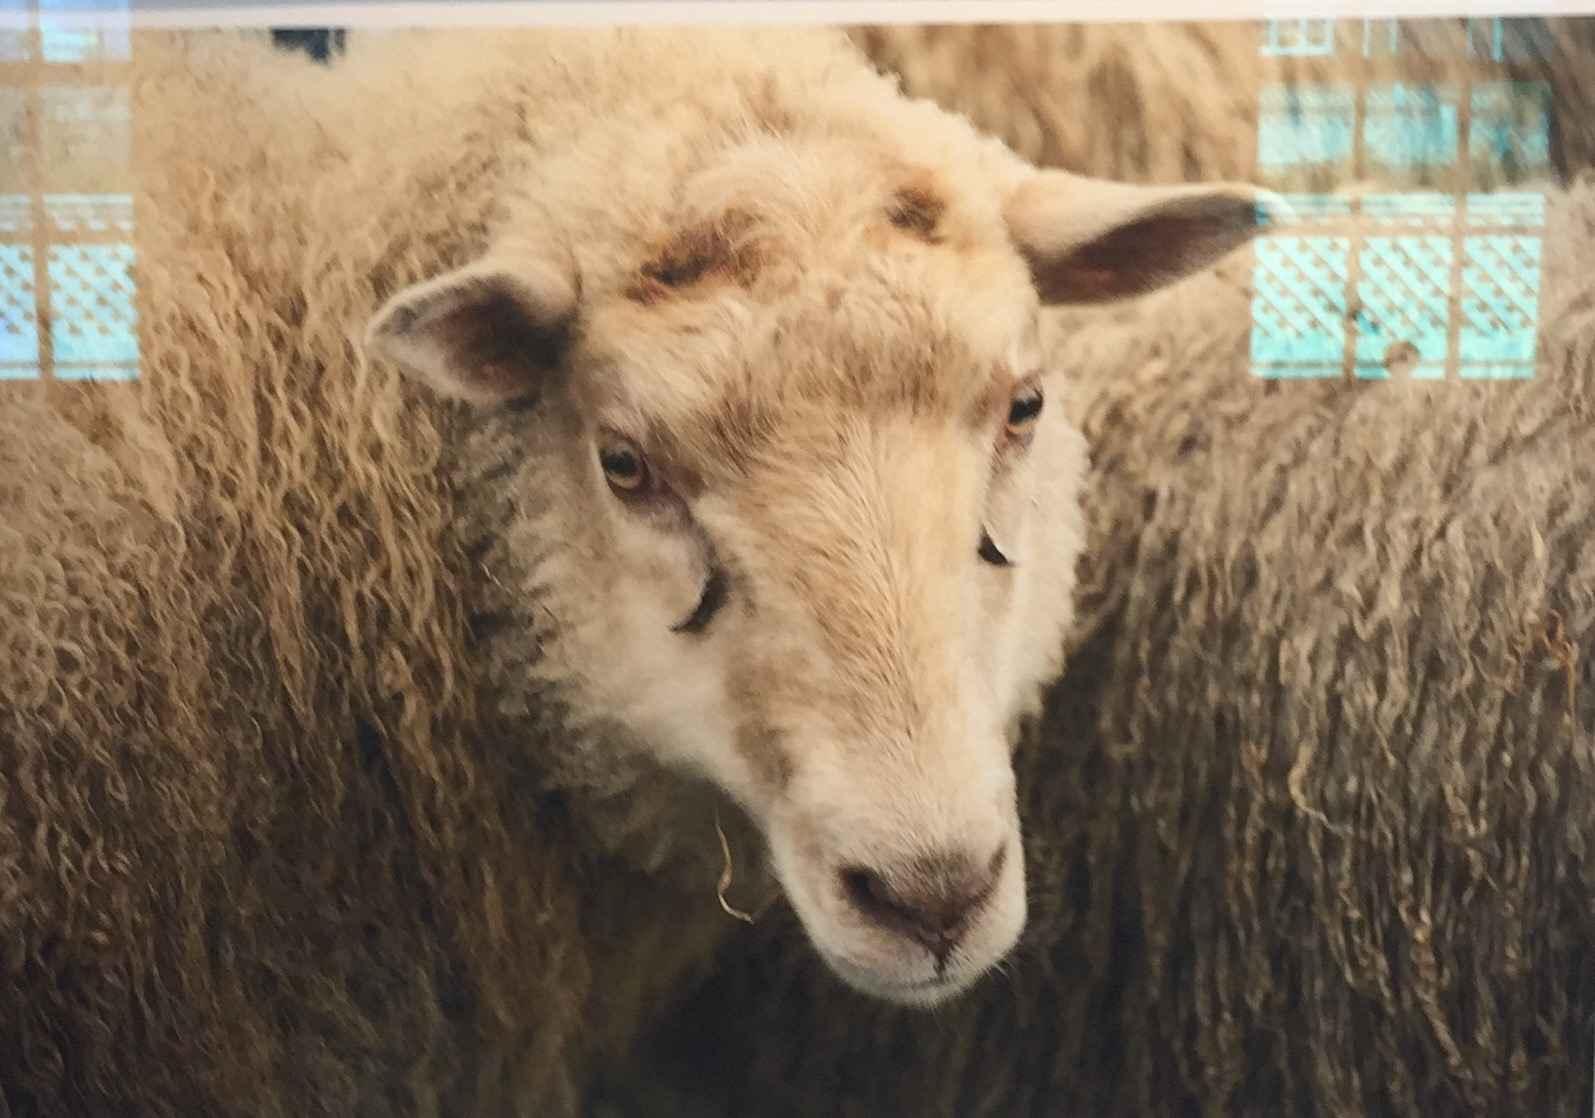 Sheep At the Fair by  Joann Frechette - Masterpiece Online